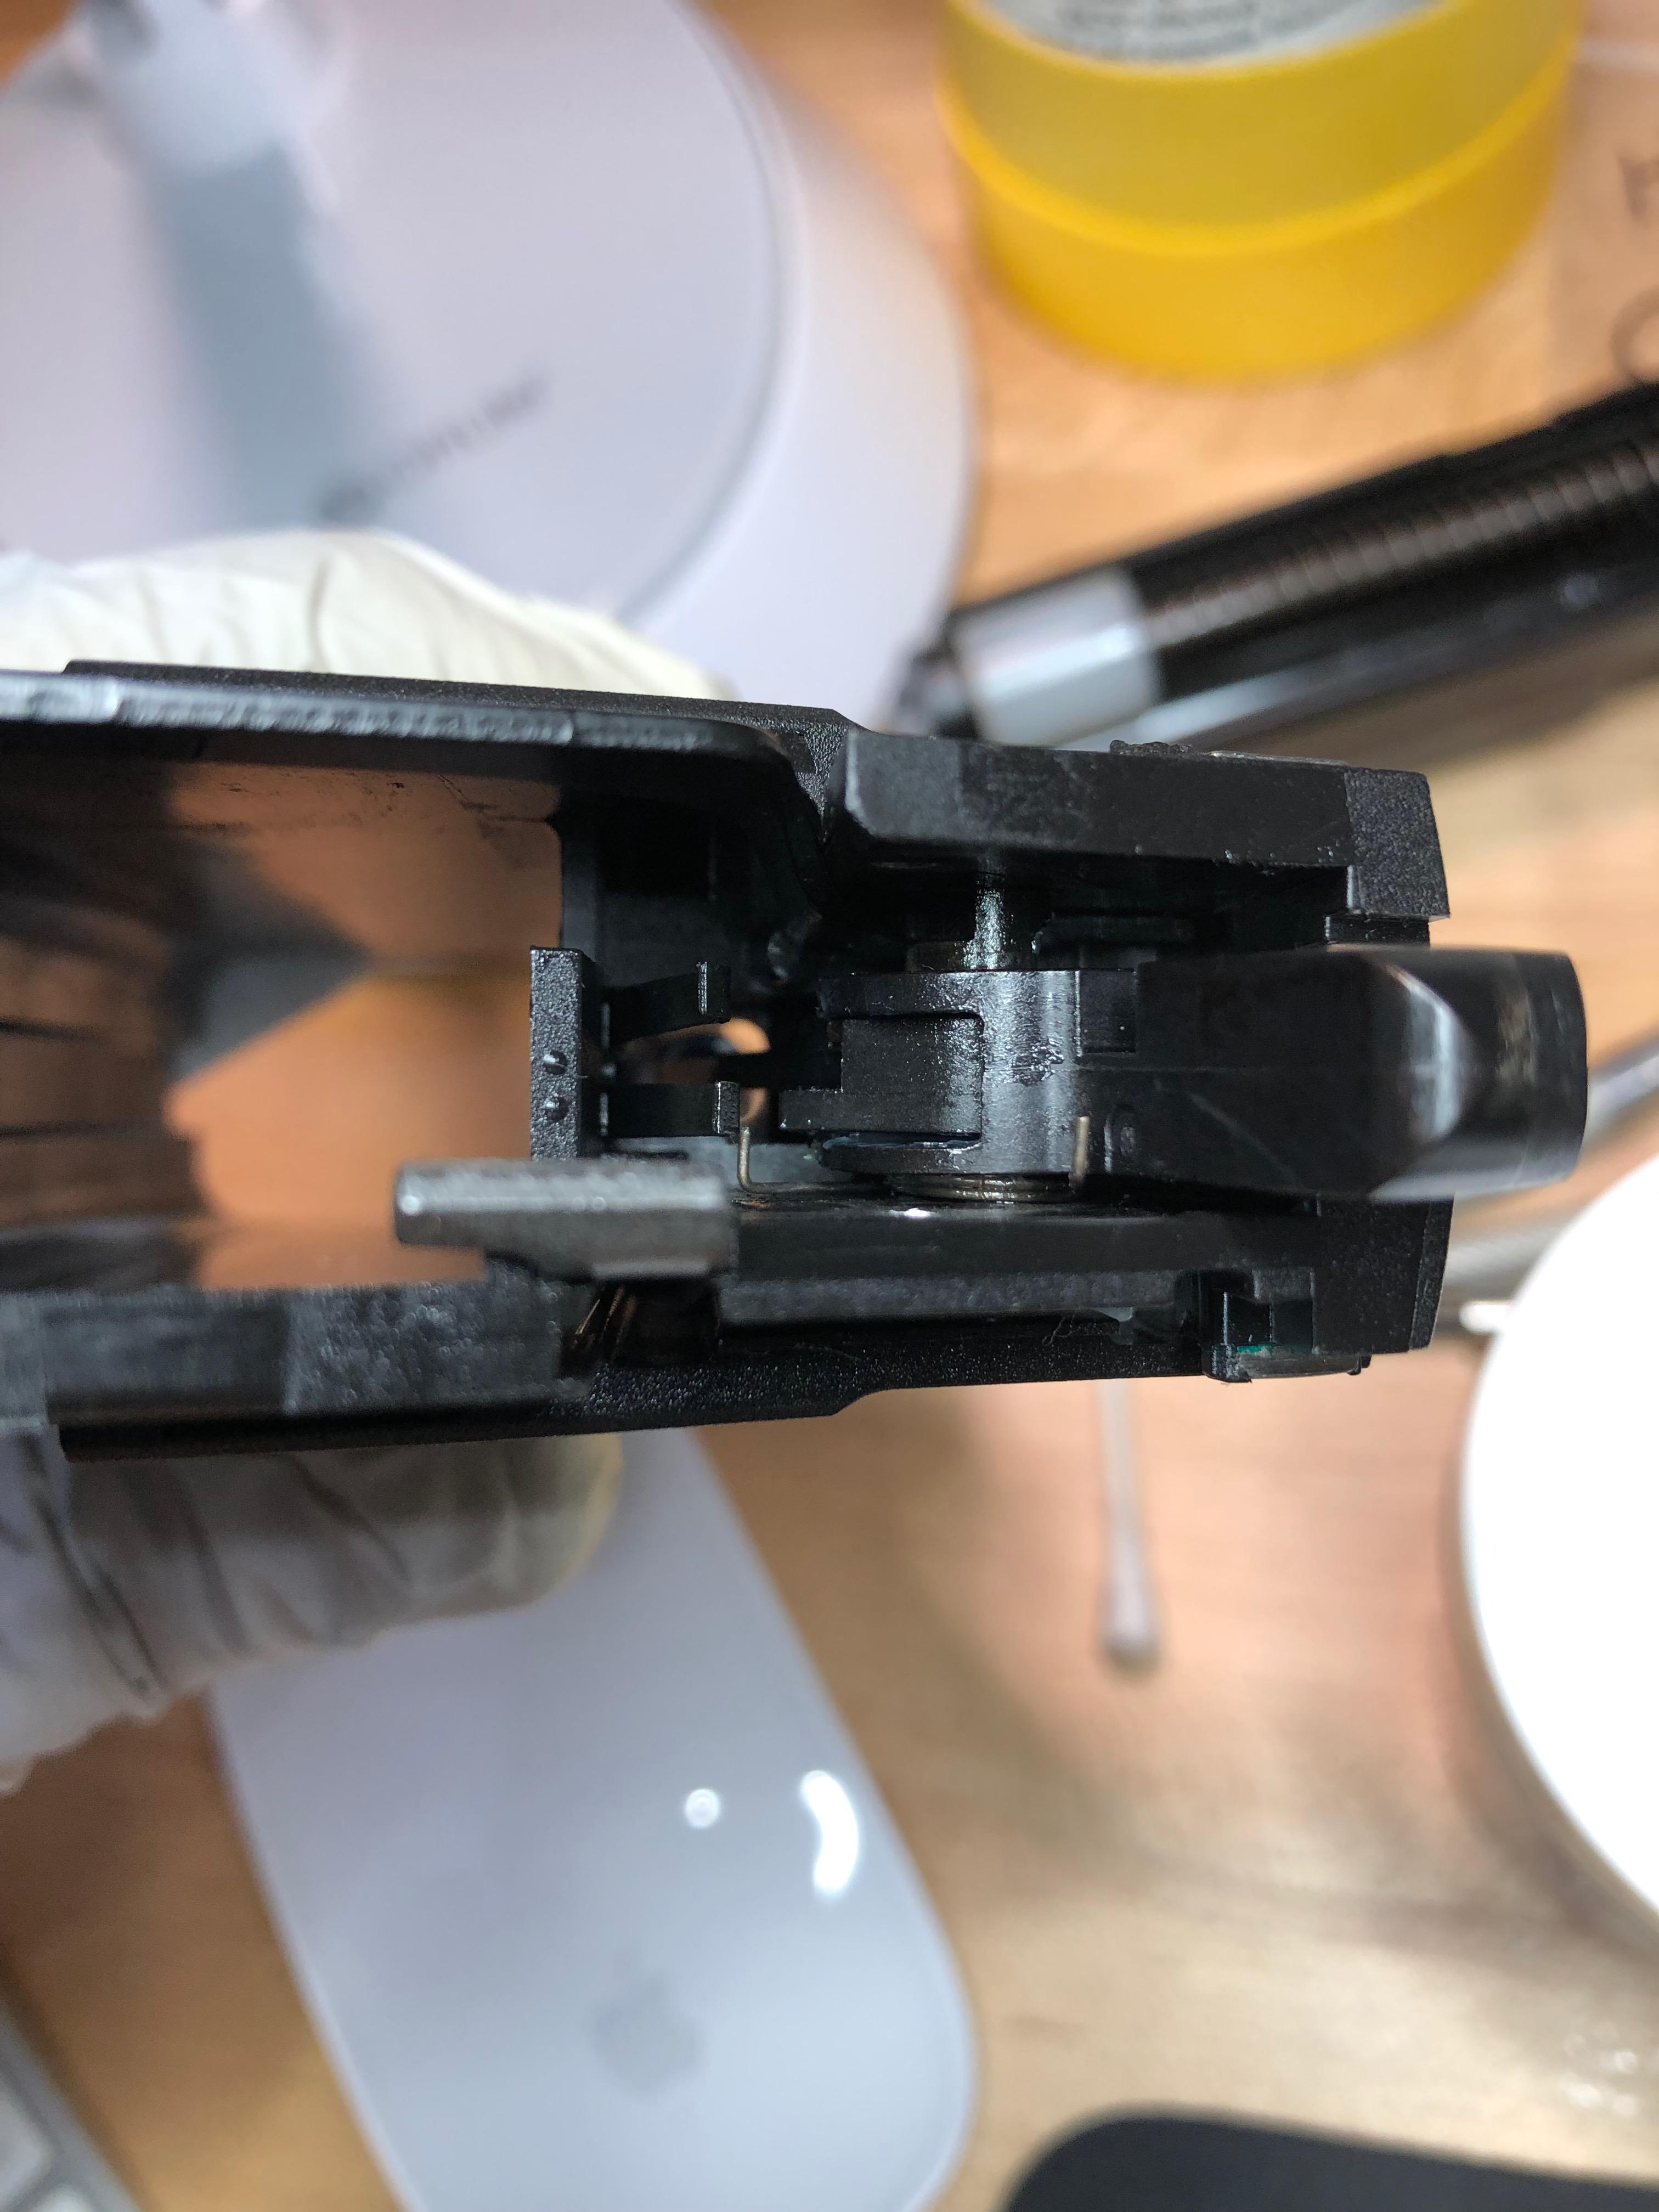 HK45 New LEM Install w/ Grayguns Short Reset Package - Doesn't Function-img_4060.jpg